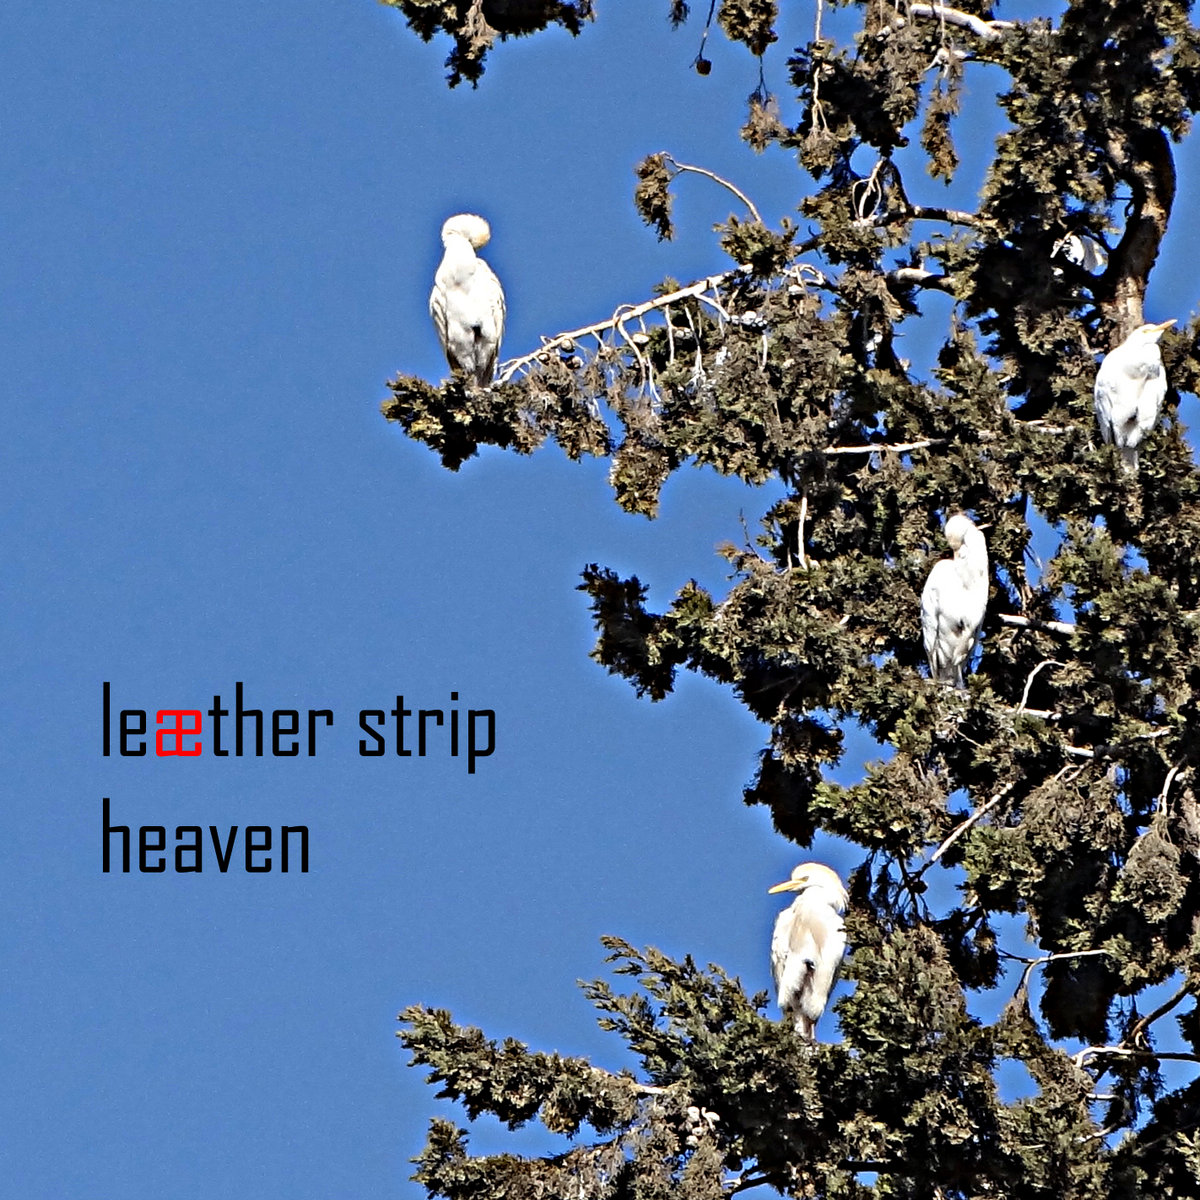 depeche mode heaven download free mp3